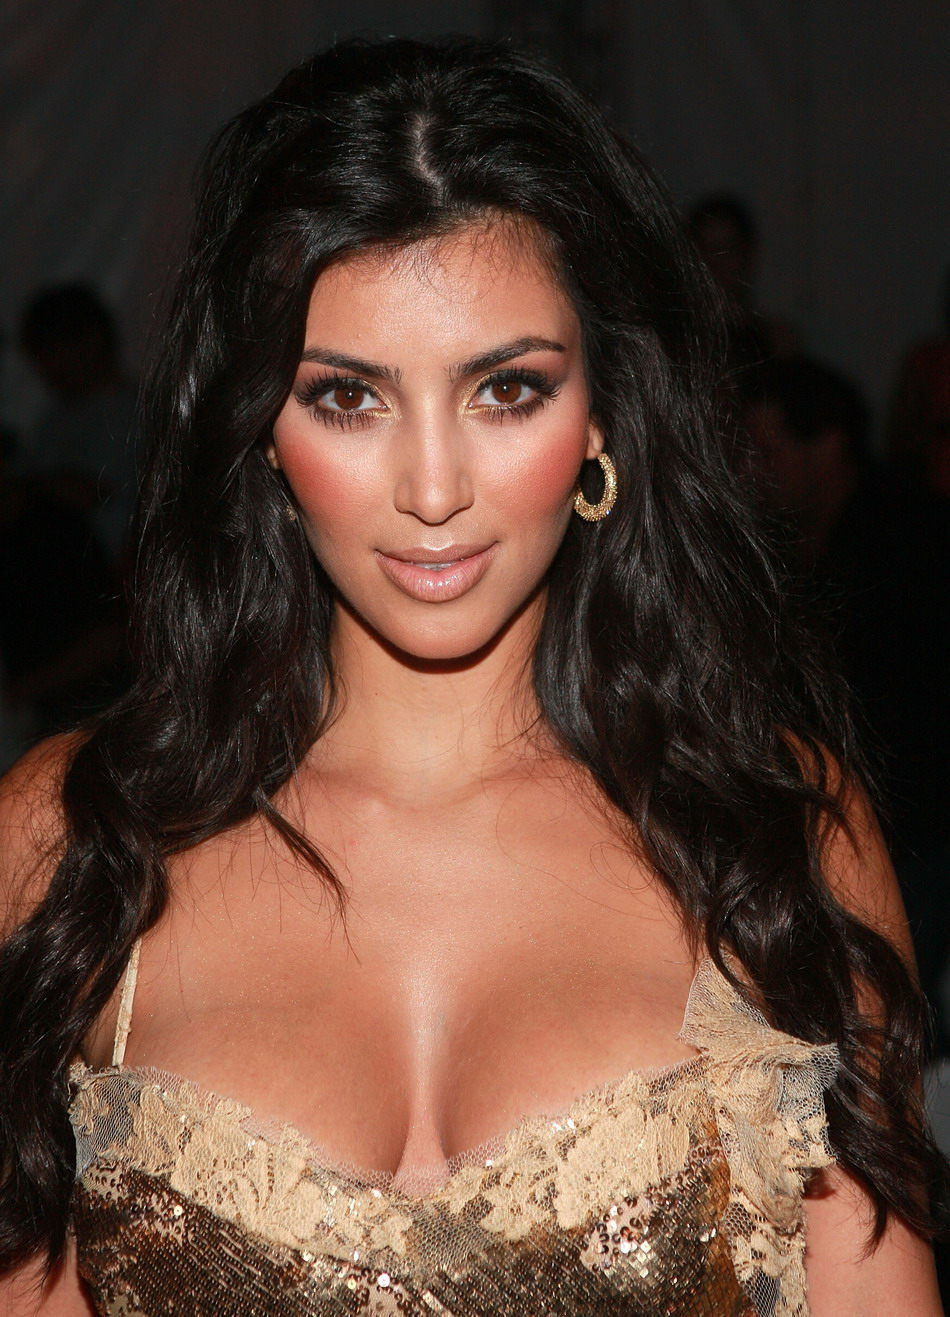 Kim Kardashian Interviews Kylie Jenner About Her Best: Ultra Cool Fun: Stunning Photos Of Kim Kardashian